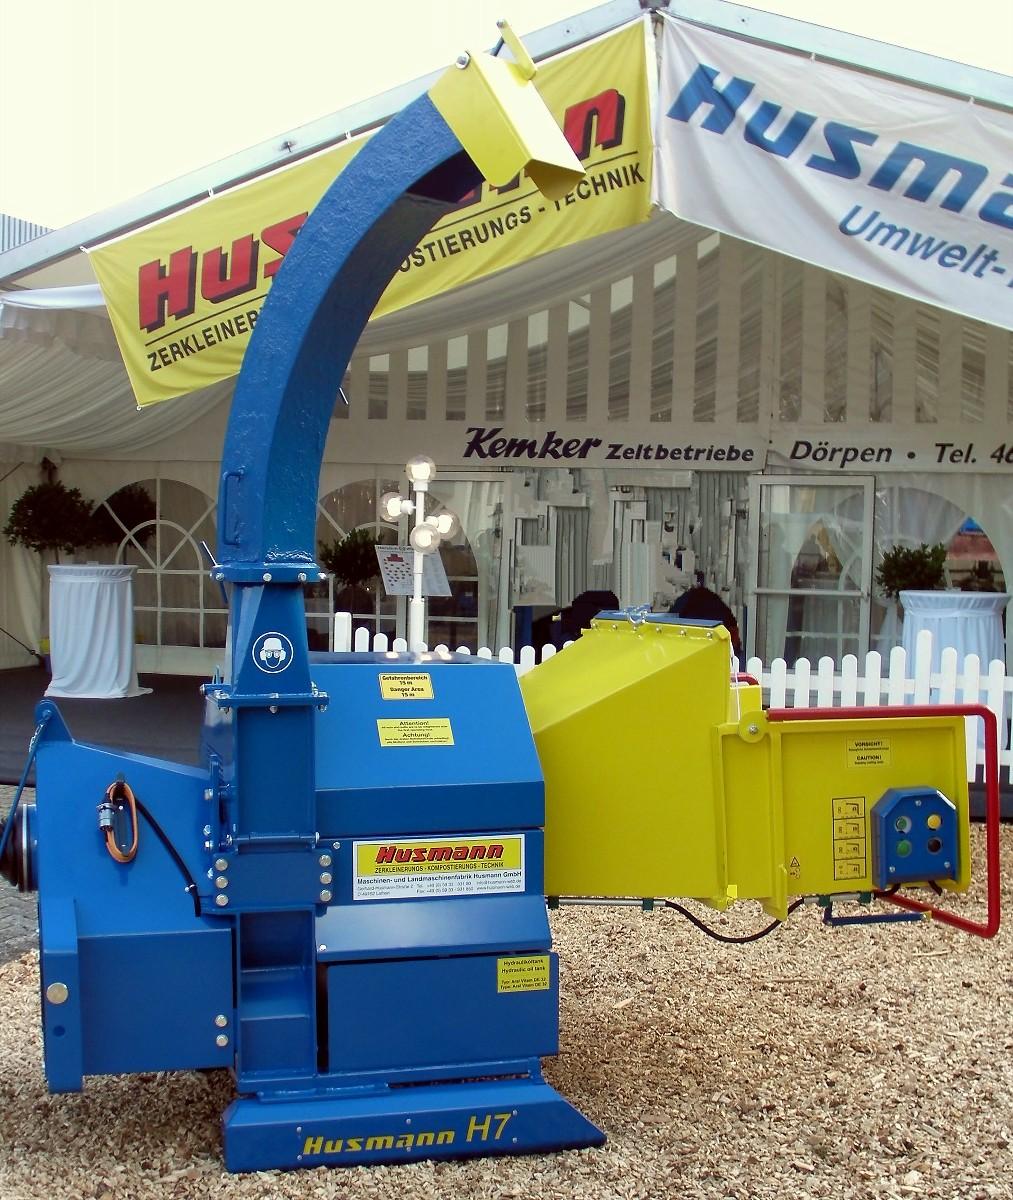 Husmann H7 (2)